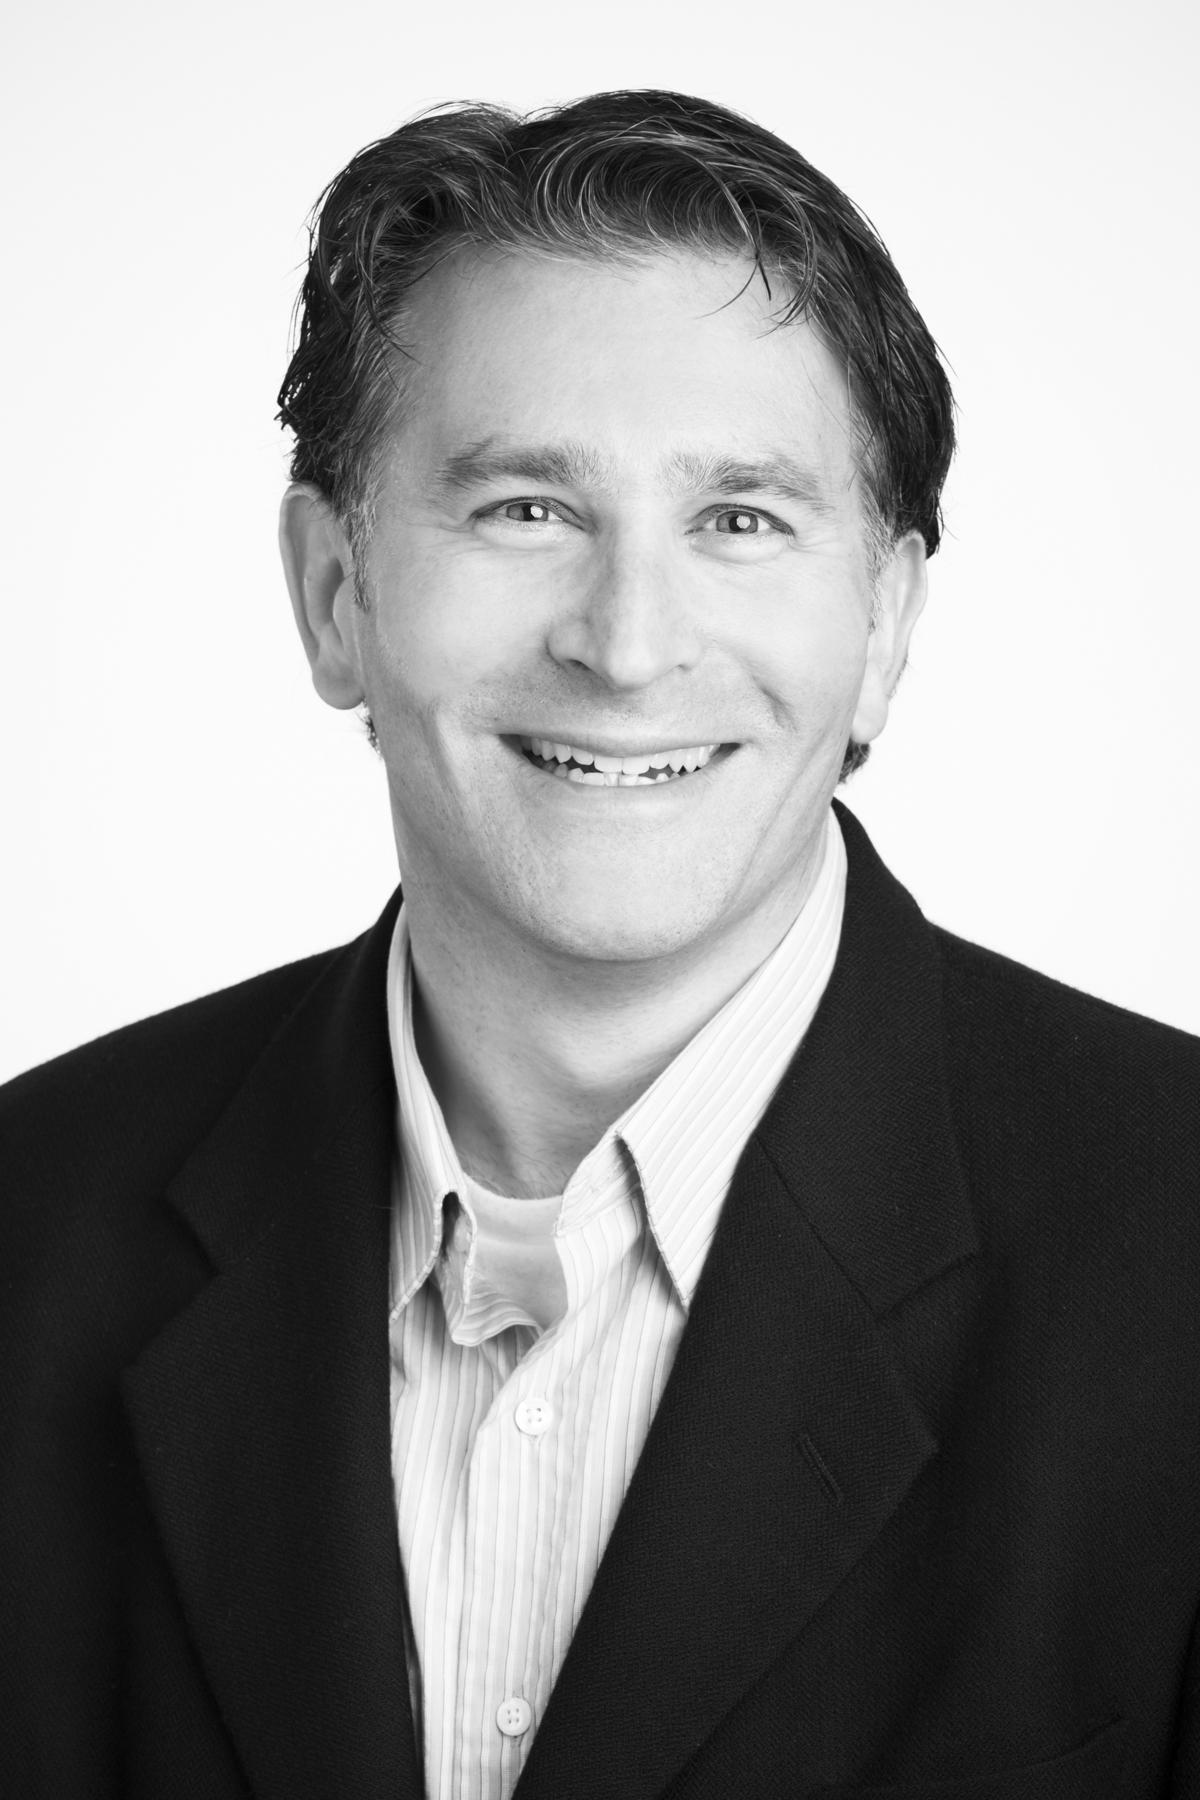 William Azaroff   Values-based Banking Community Investment Cooperative Philosophy      Meet William